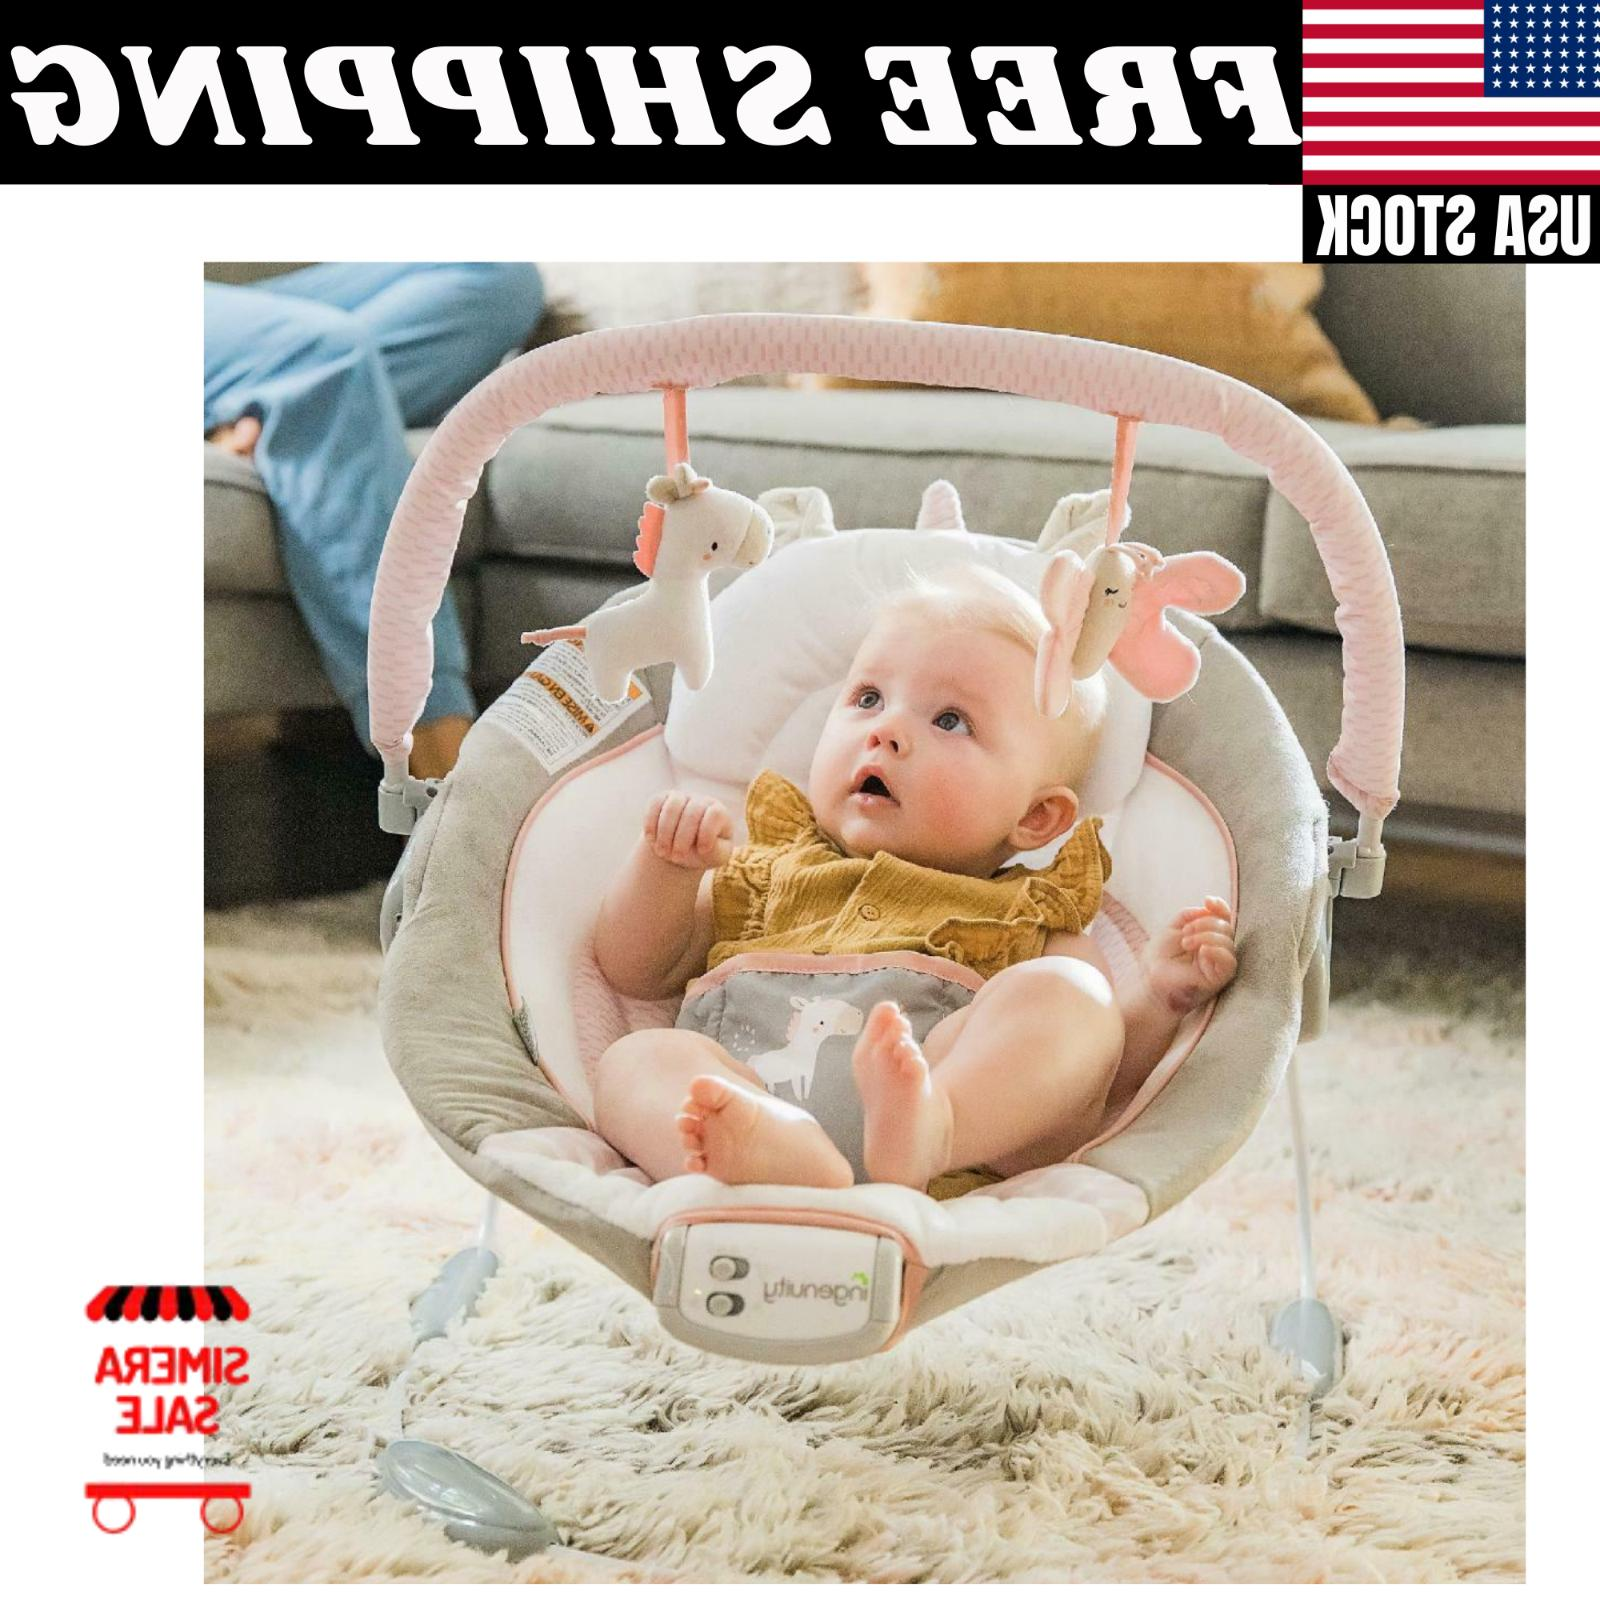 Cradling Bouncer - Seat Baby Infant Vibration